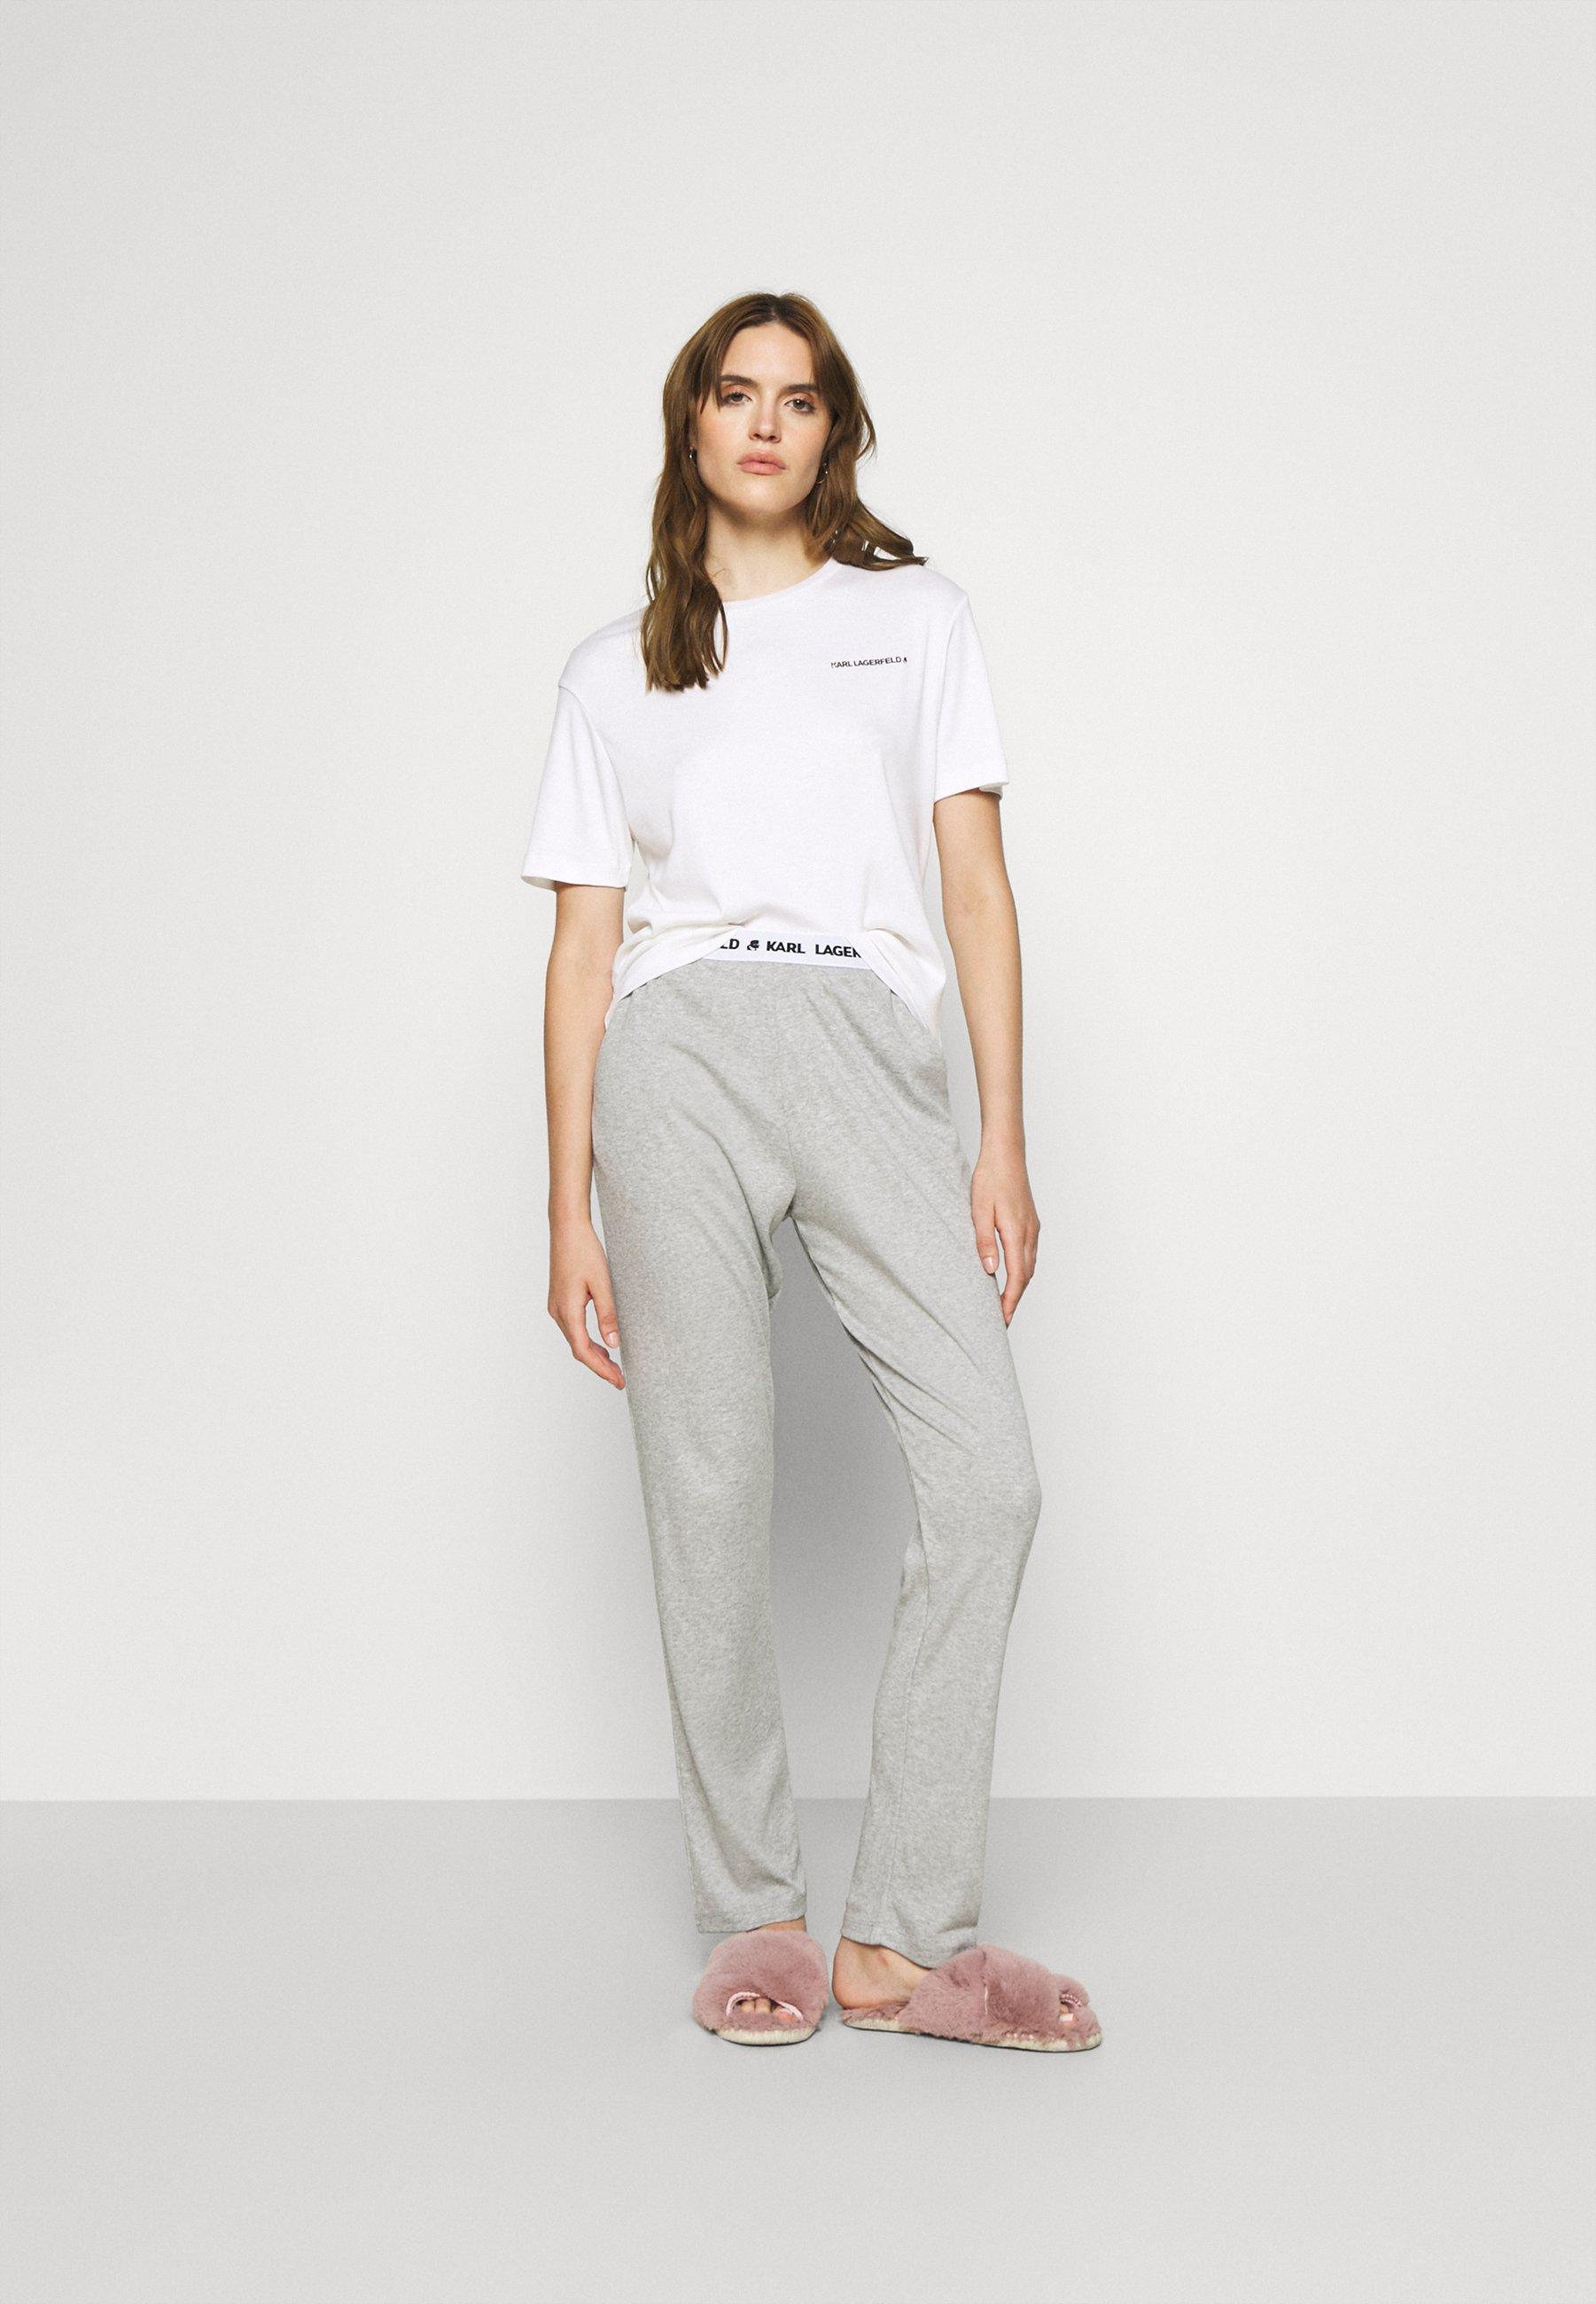 Damen LOGO - Nachtwäsche Shirt